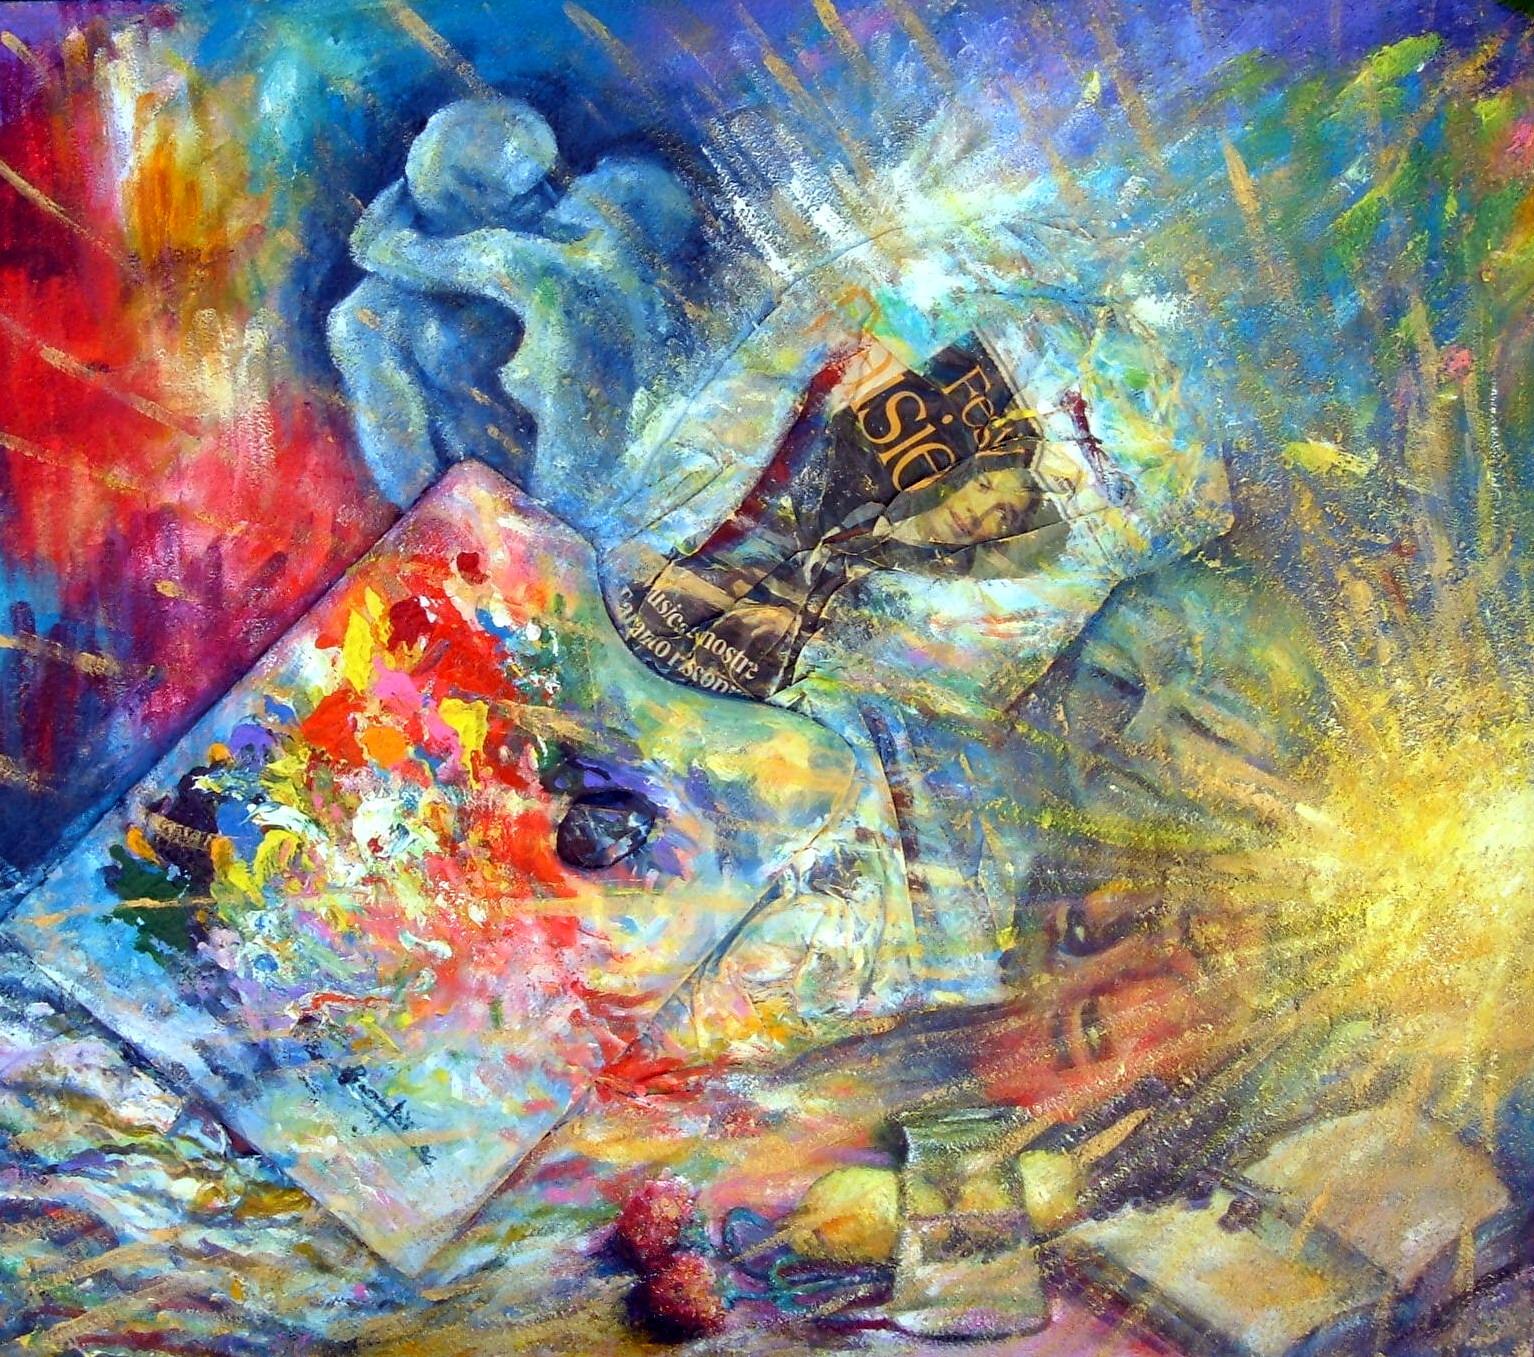 L'amore per l'arte - Rosario R...